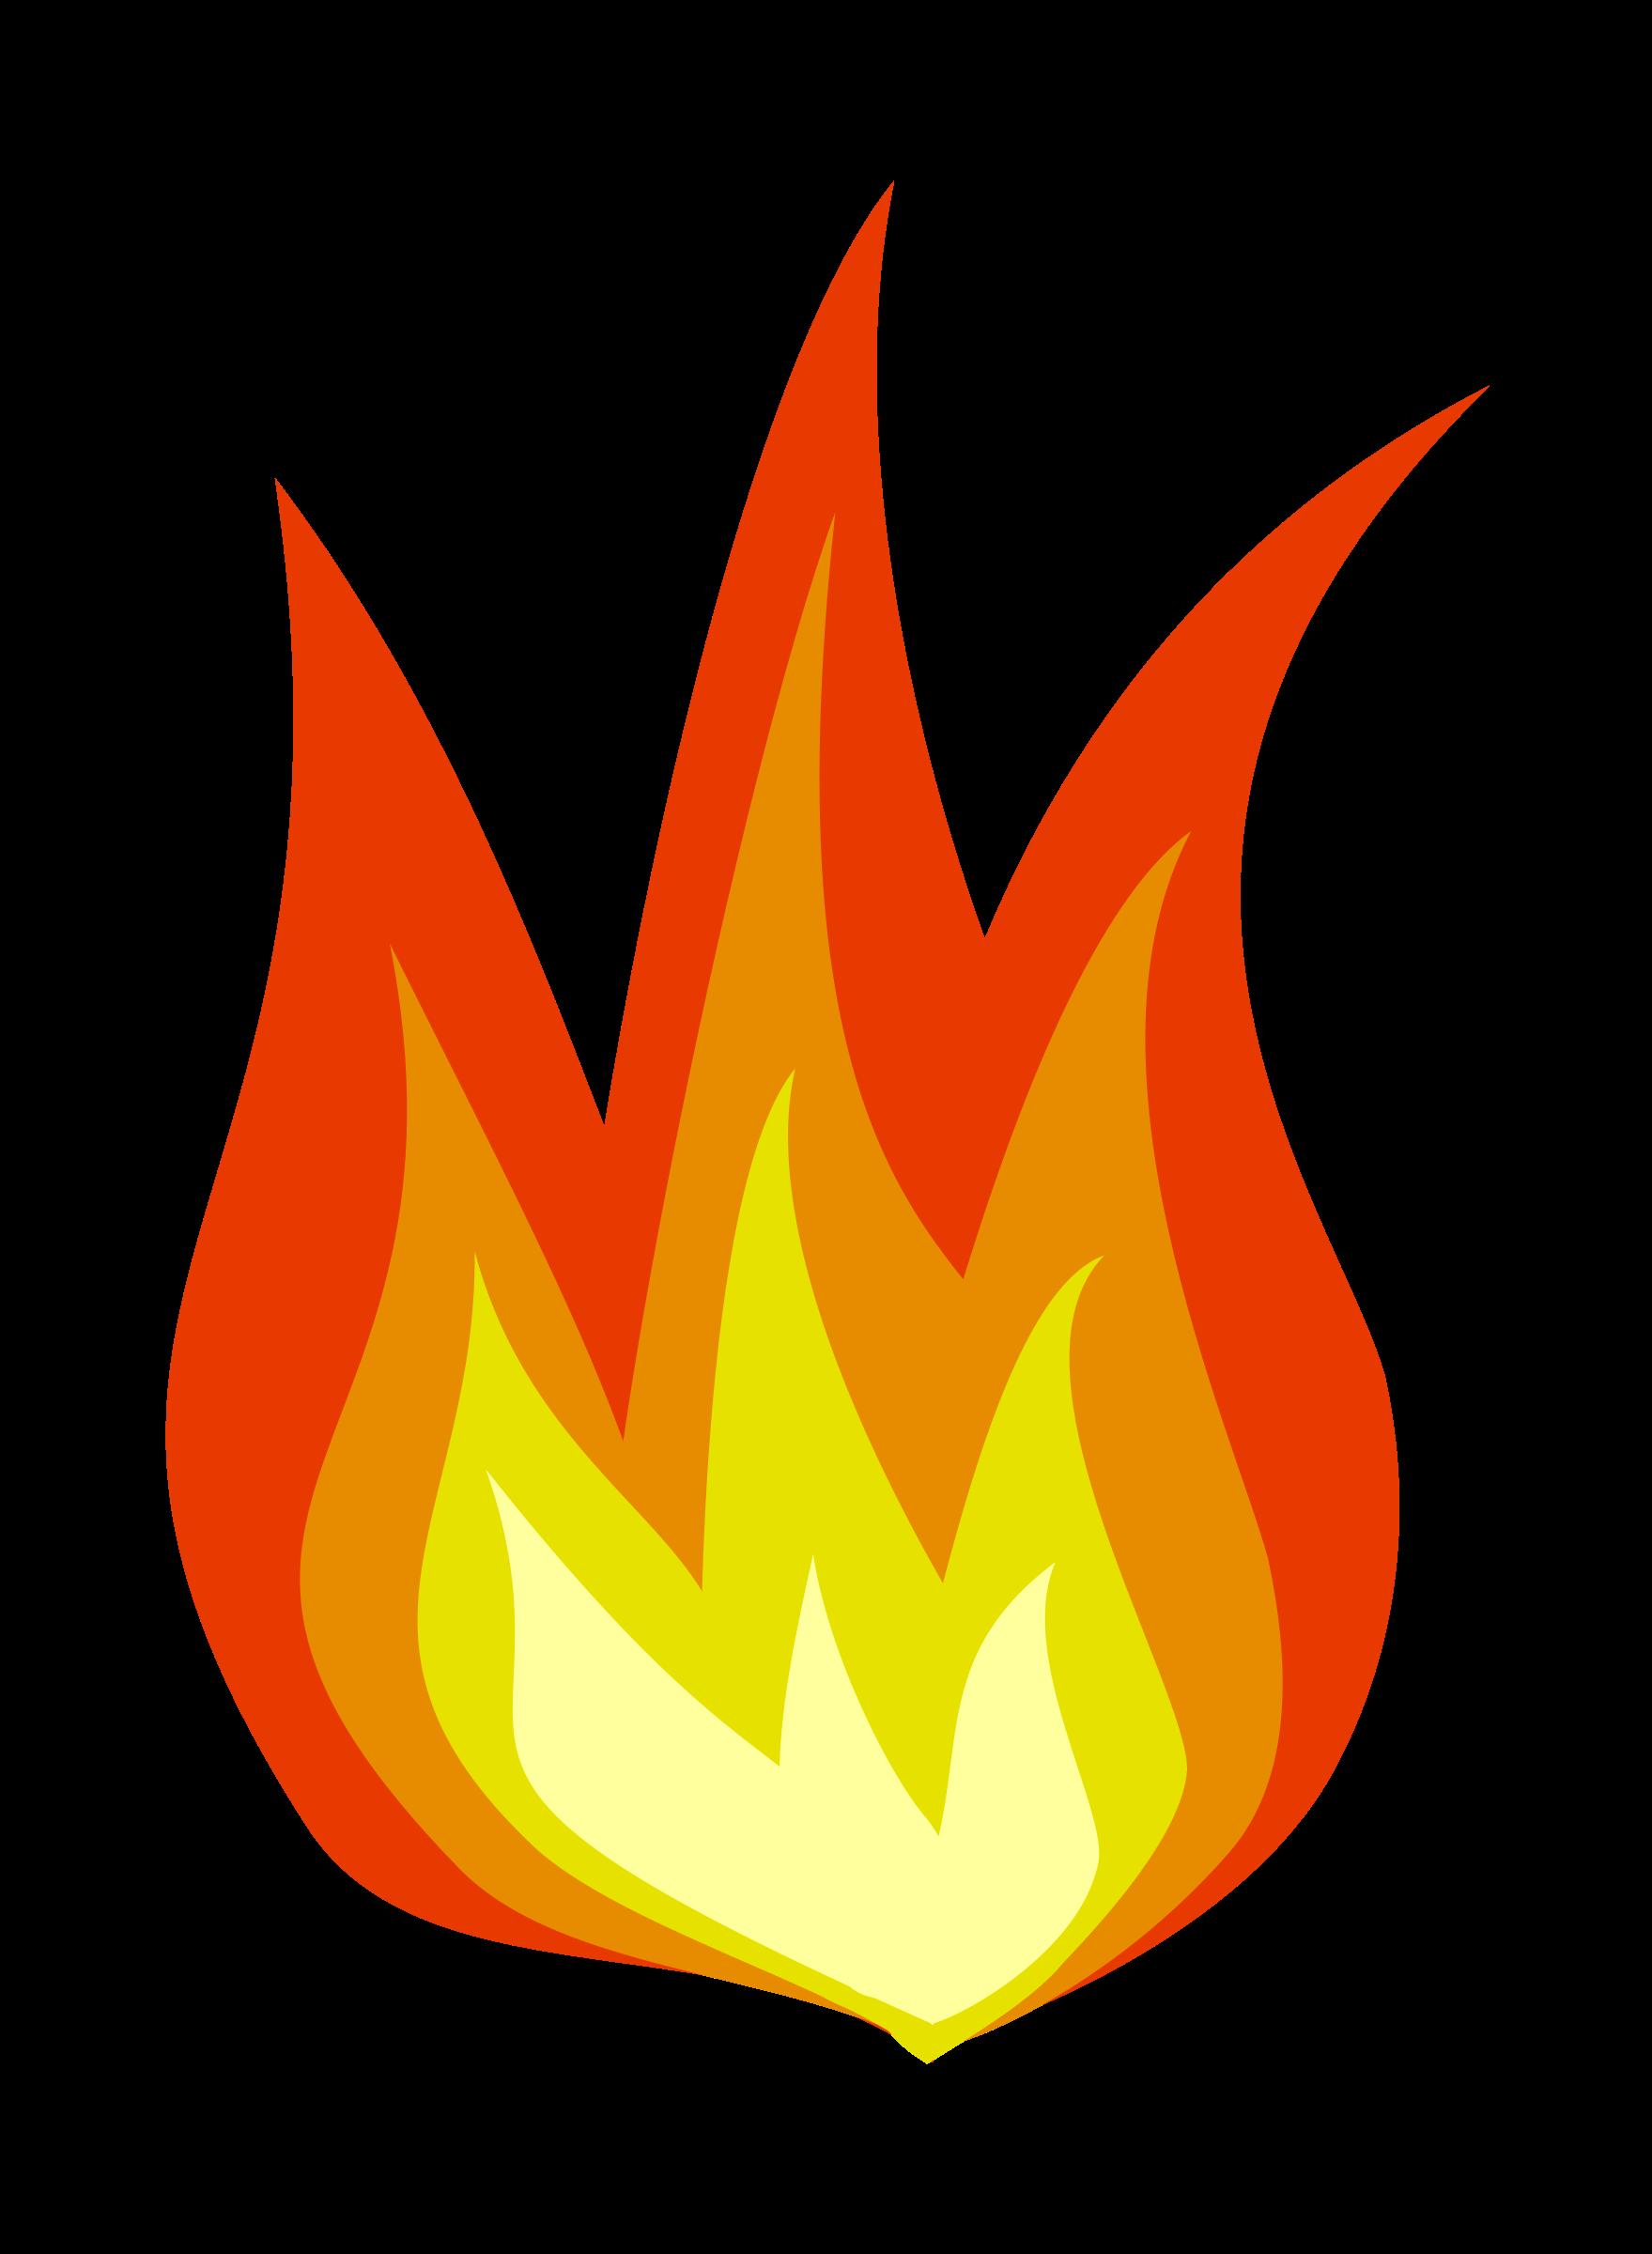 Heart fire clipart jpg black and white download By The Fire Clipart jpg black and white download